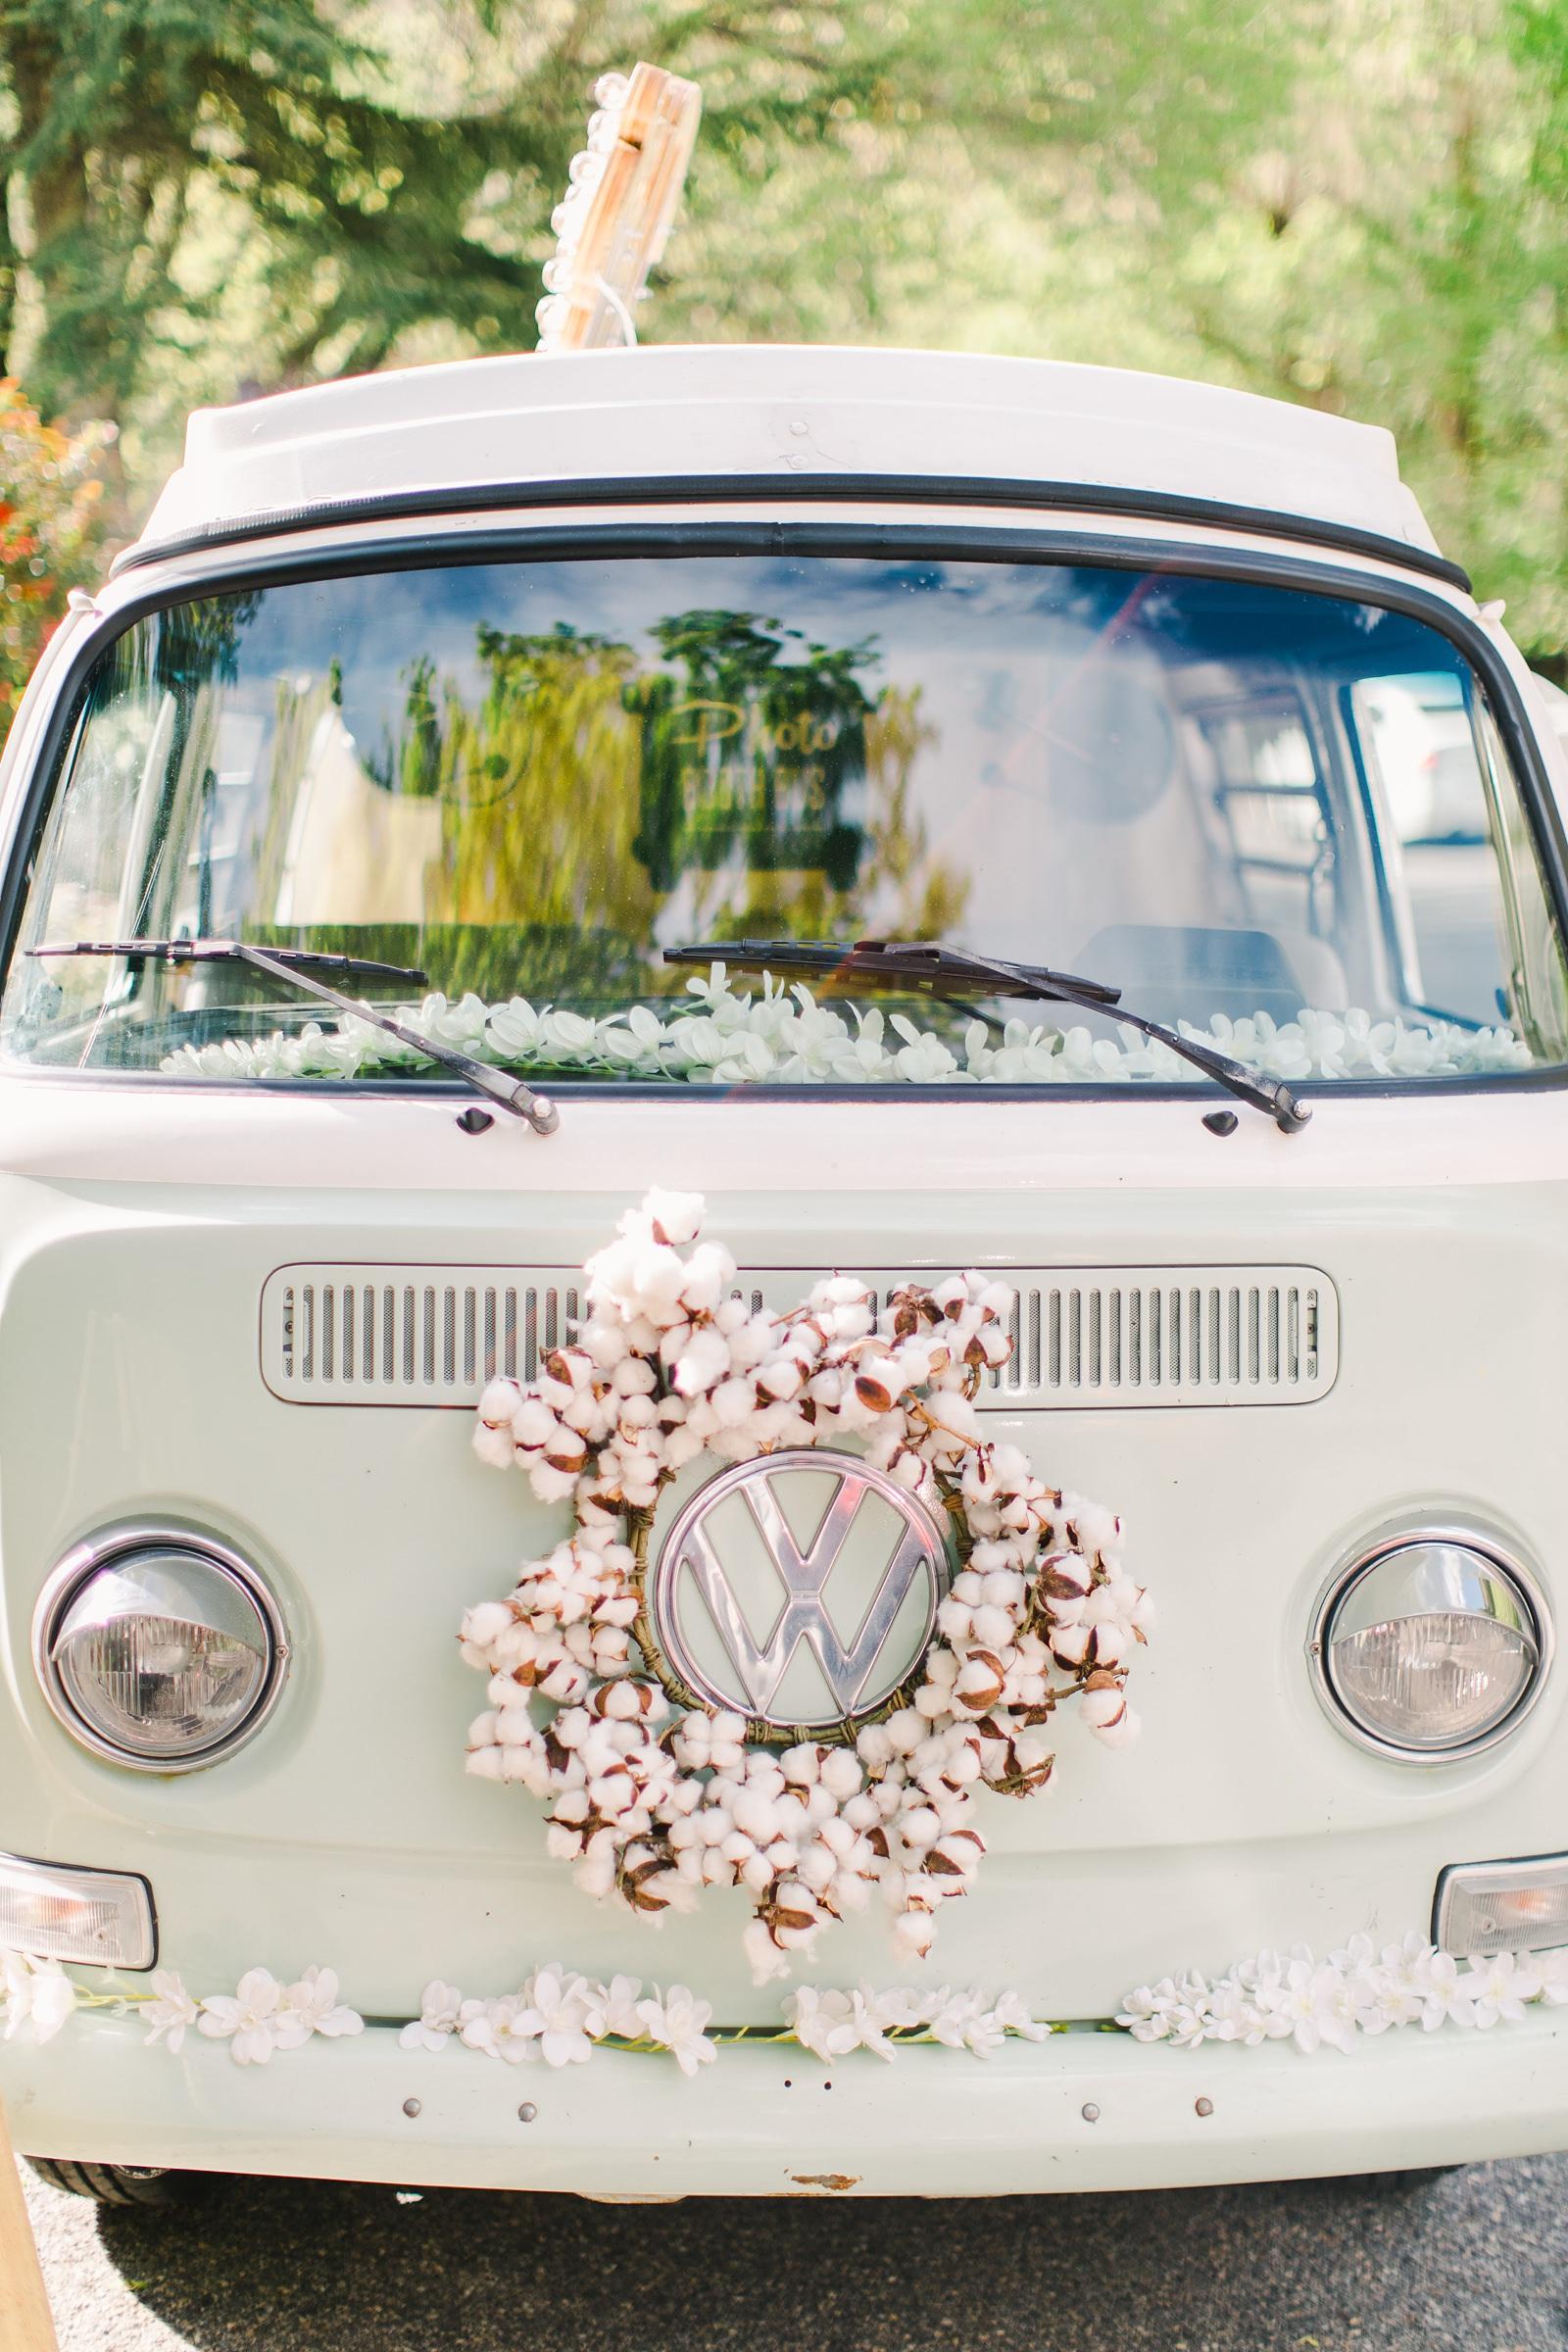 Millcreek Inn Summer Wedding, Utah wedding photography Millcreek Canyon, Salt Lake City, vintage VW bus photo booth